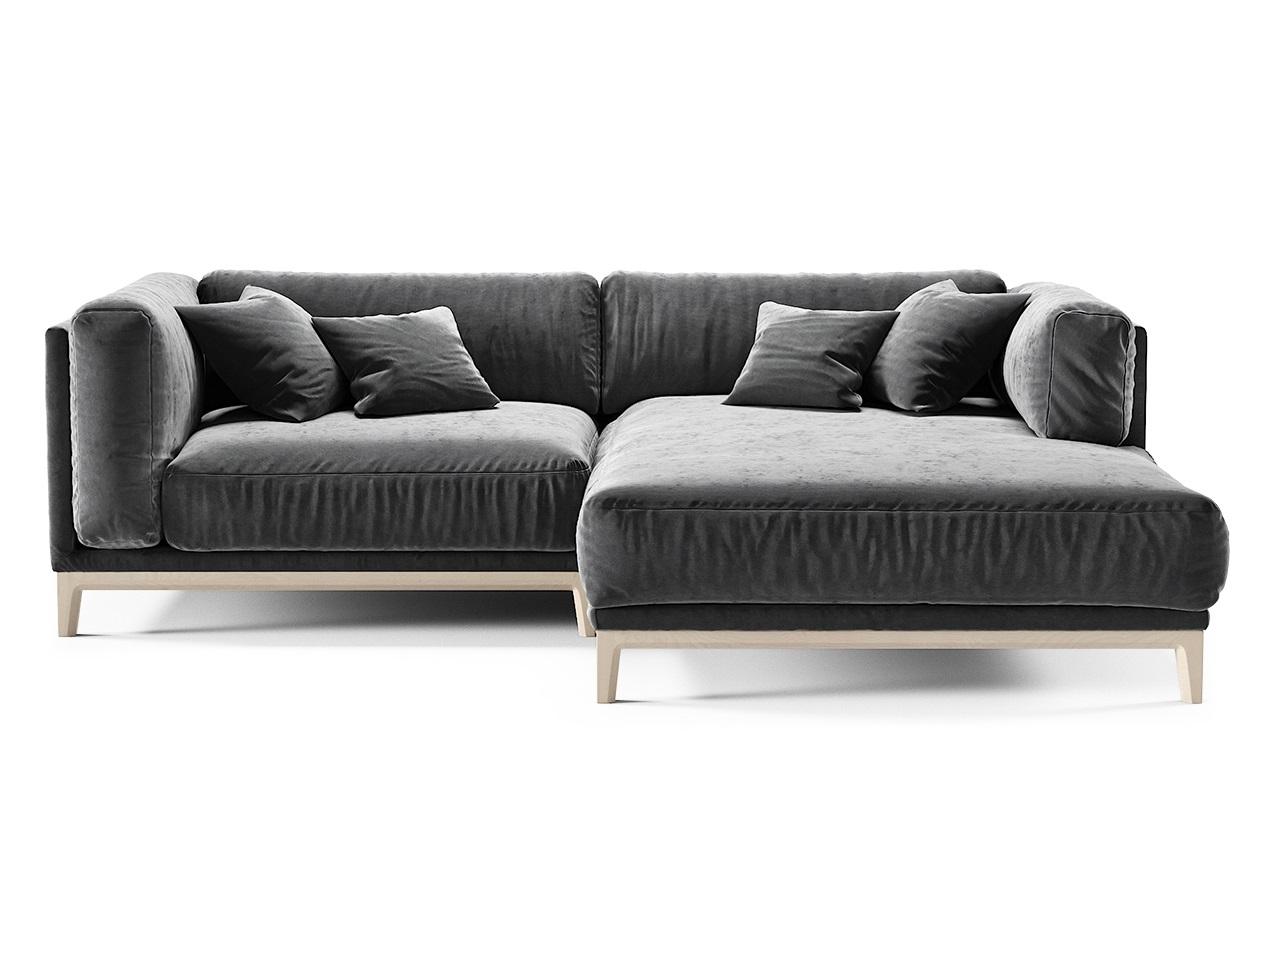 The idea диван case (беленая береза, микровелюр) серый 81061/1